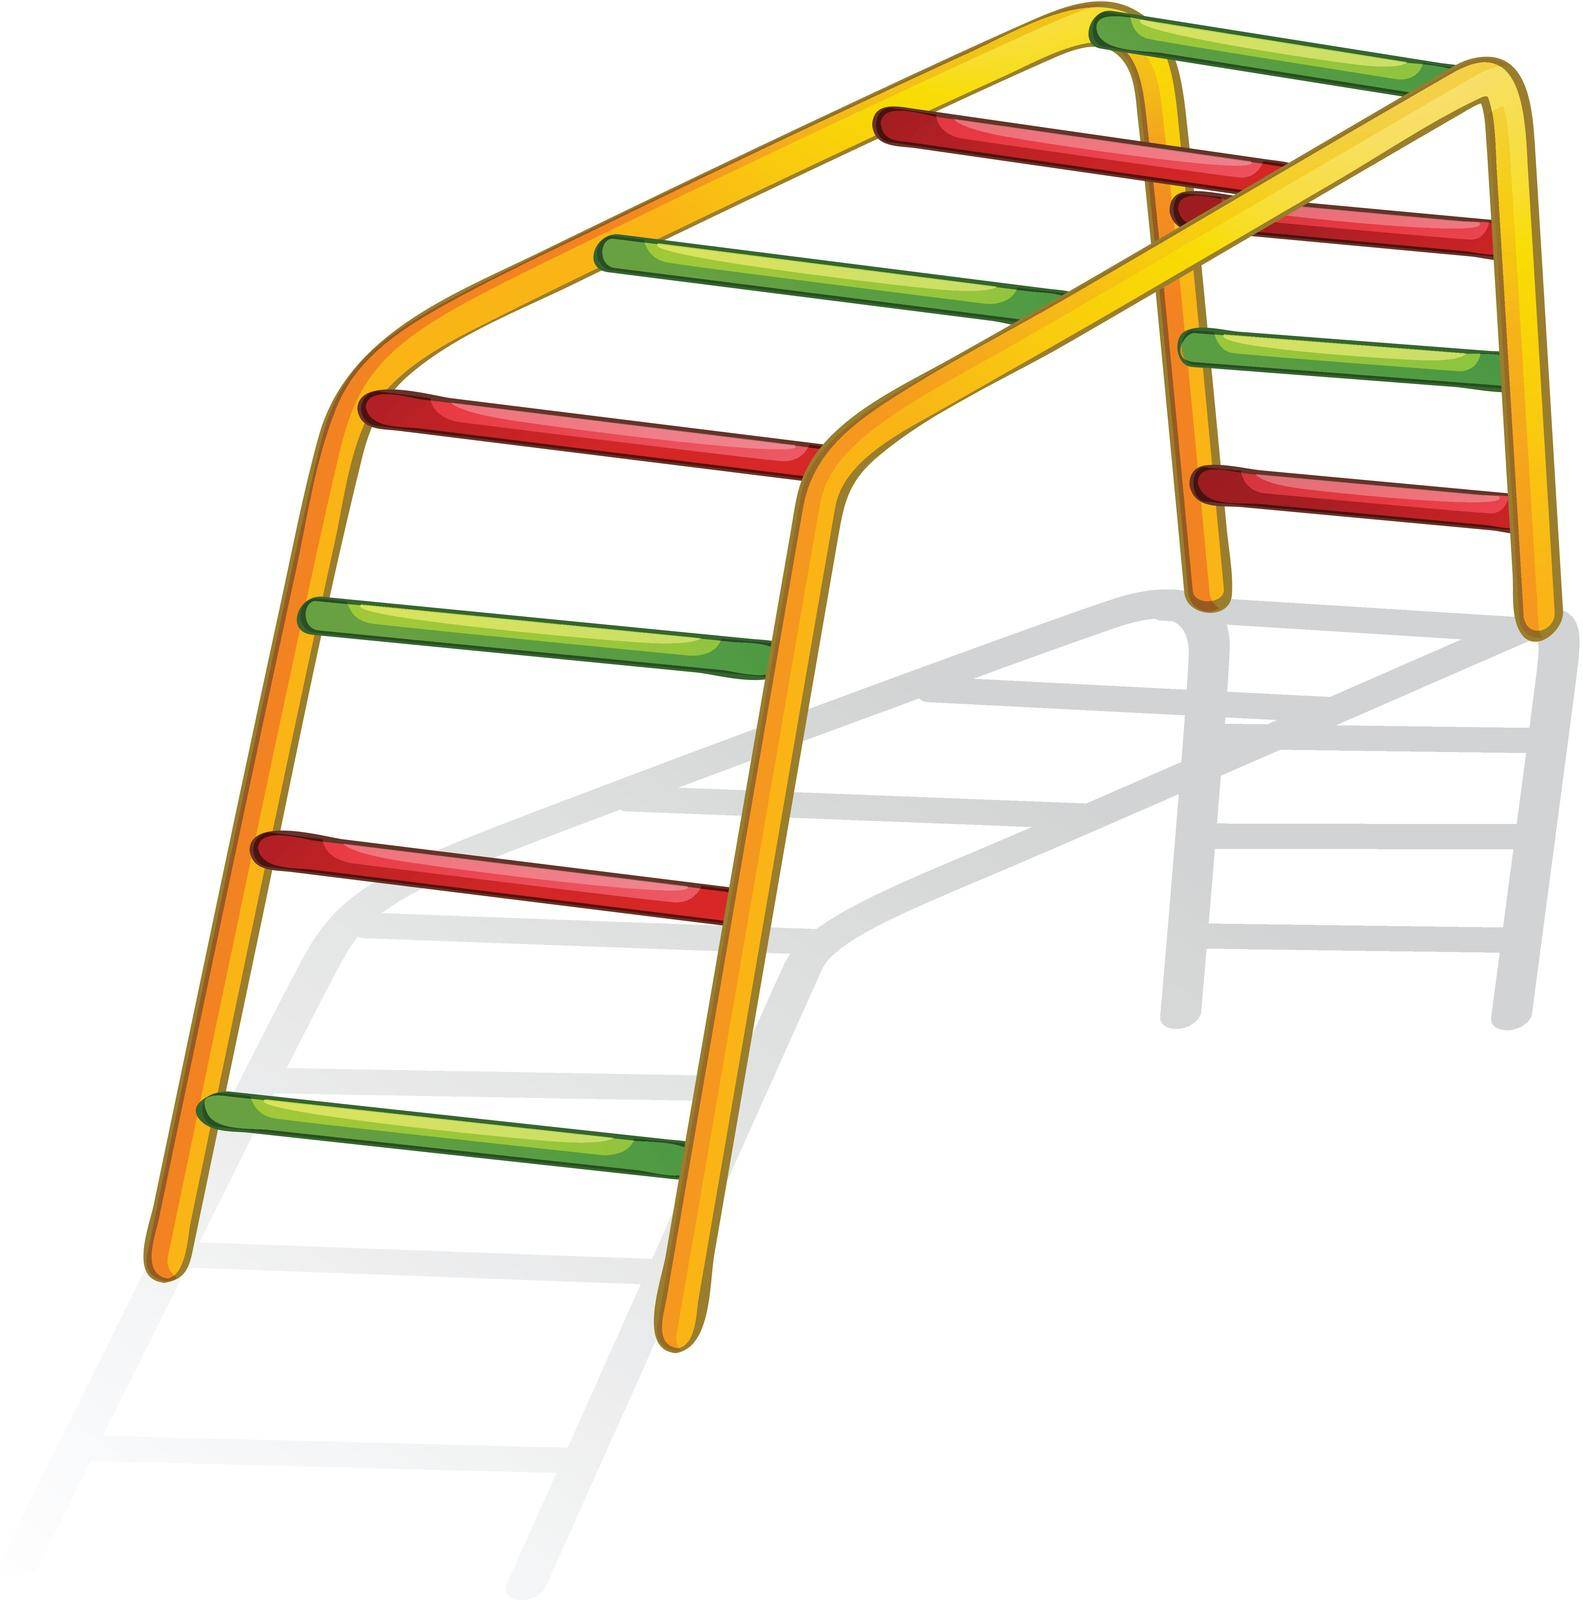 Isolated illustration of play equipment - monkey bars